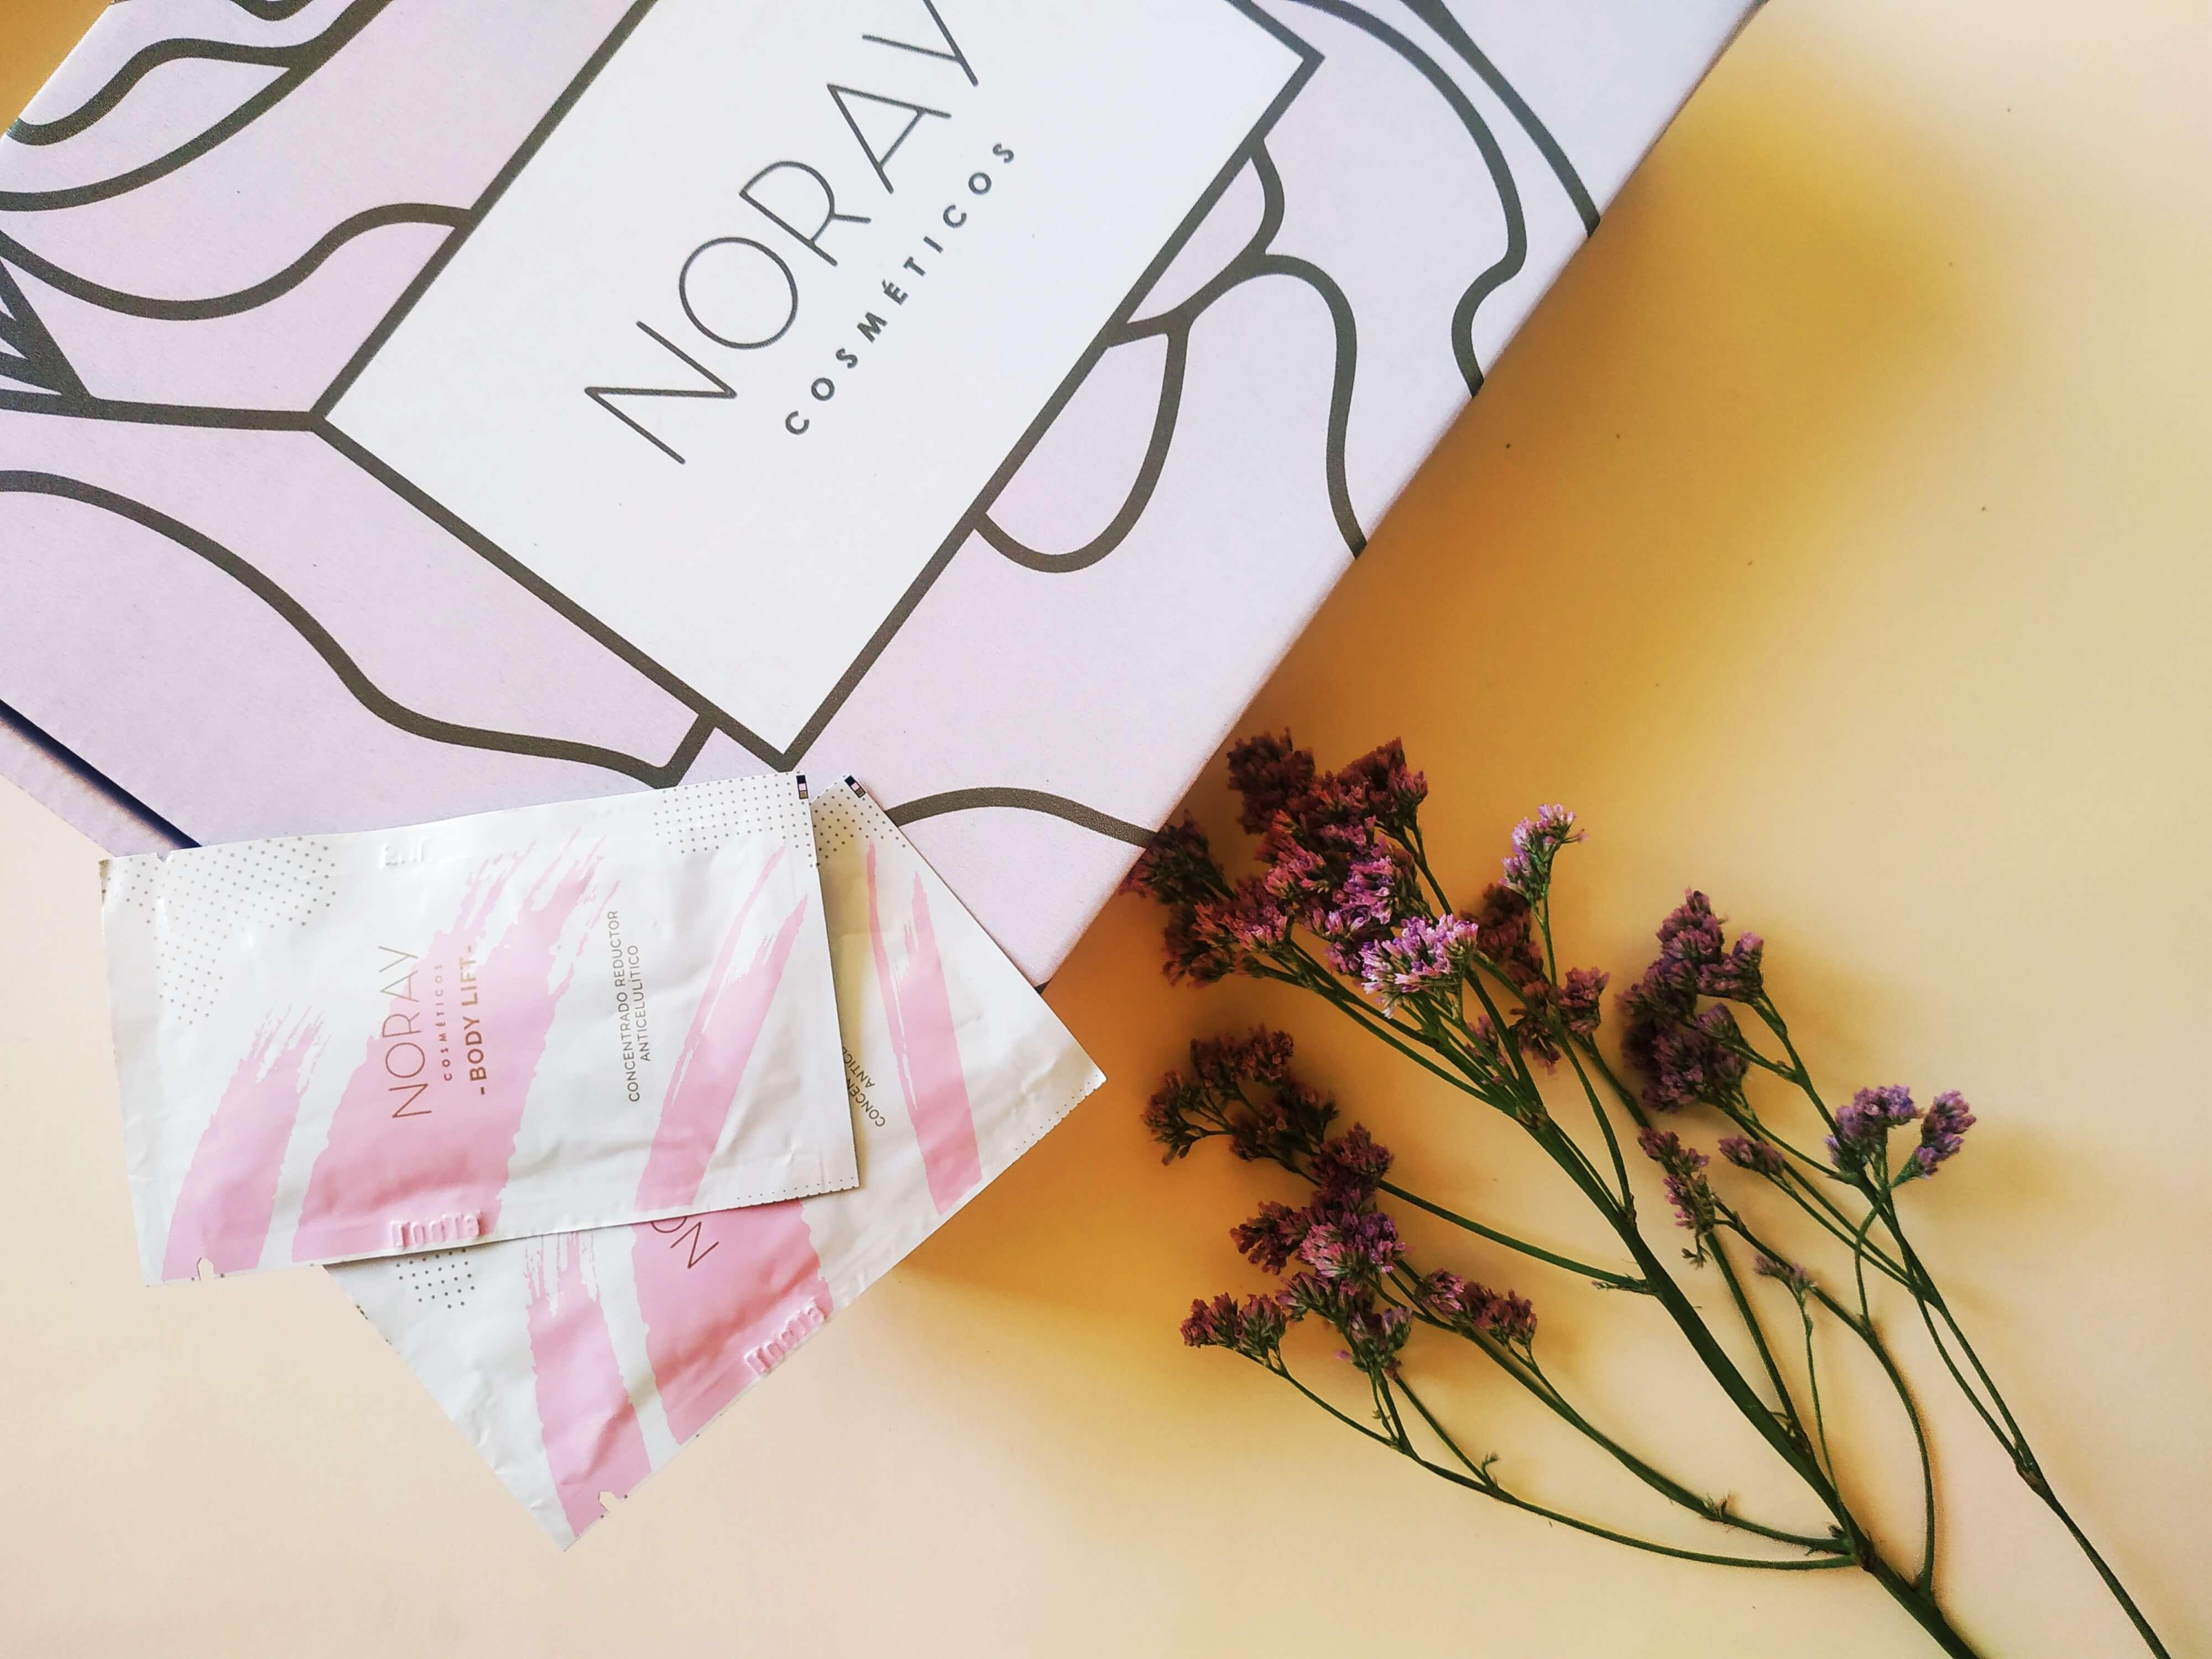 Caja para enviar productos cosméticos